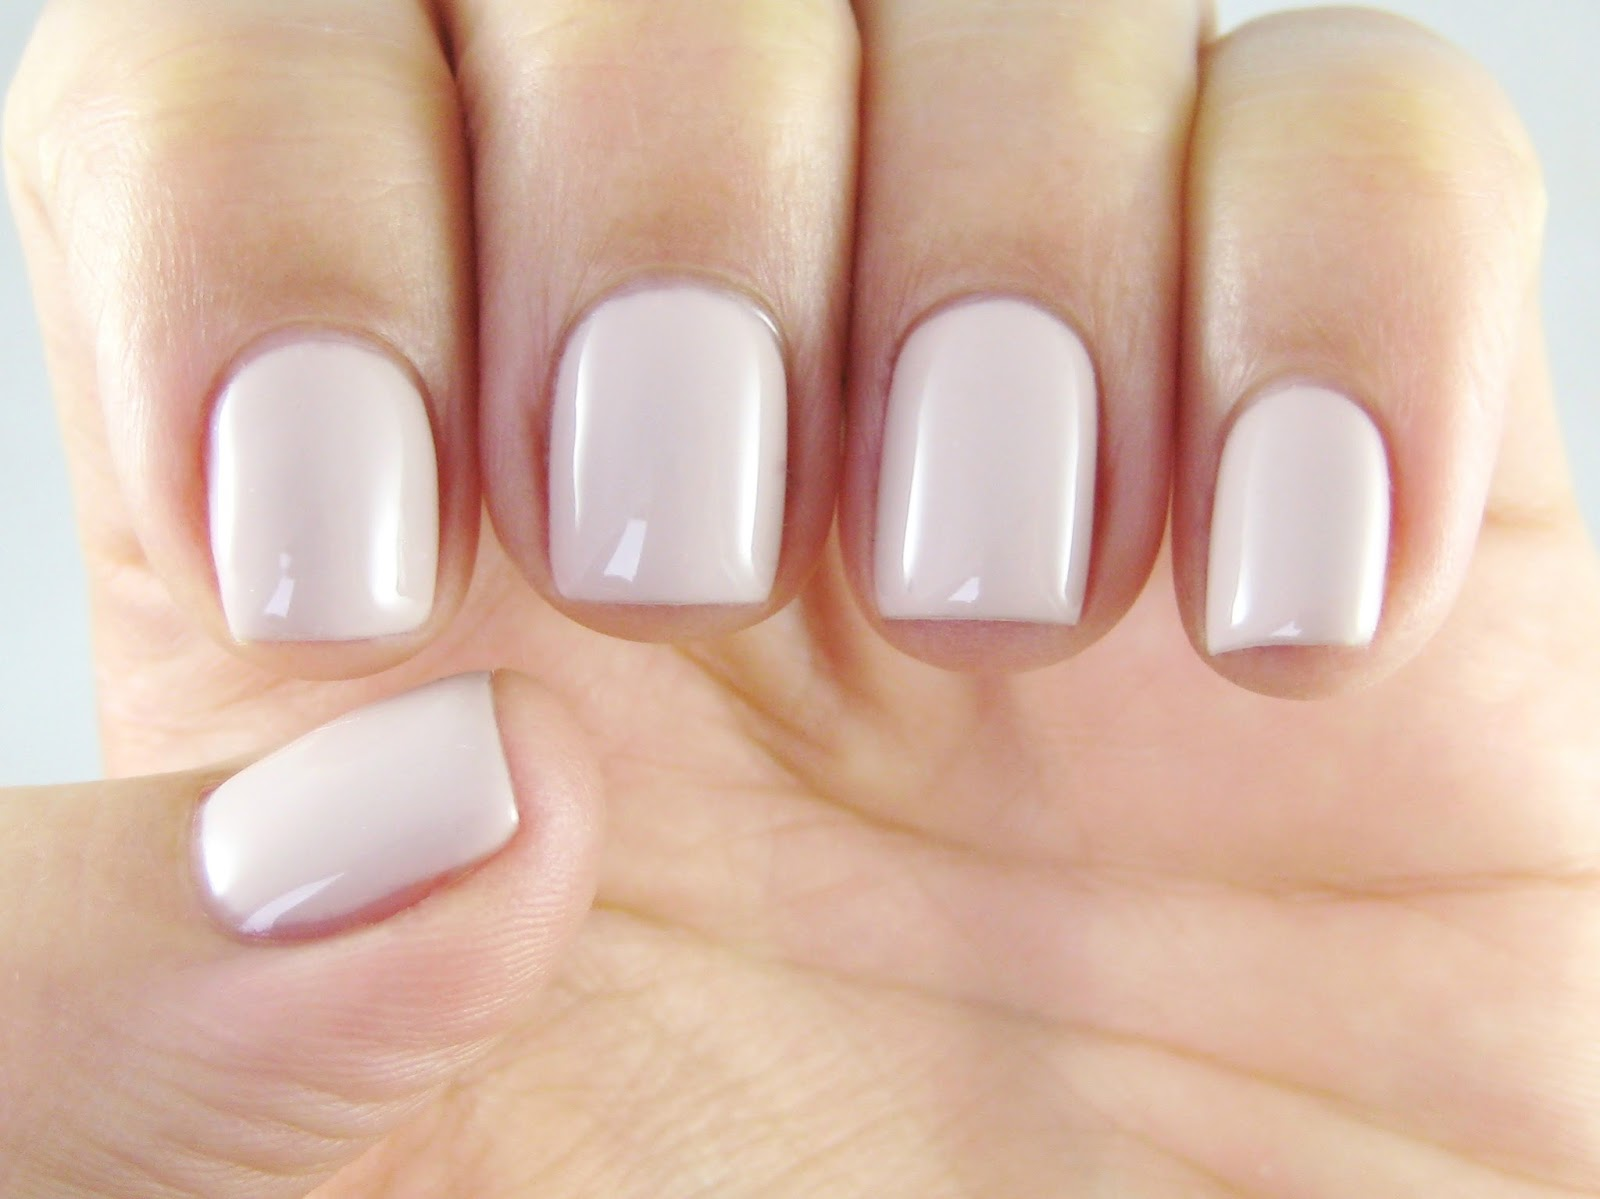 Dahlia nails red carpet manicure diy gel manicure diy gel manicure solutioingenieria Choice Image